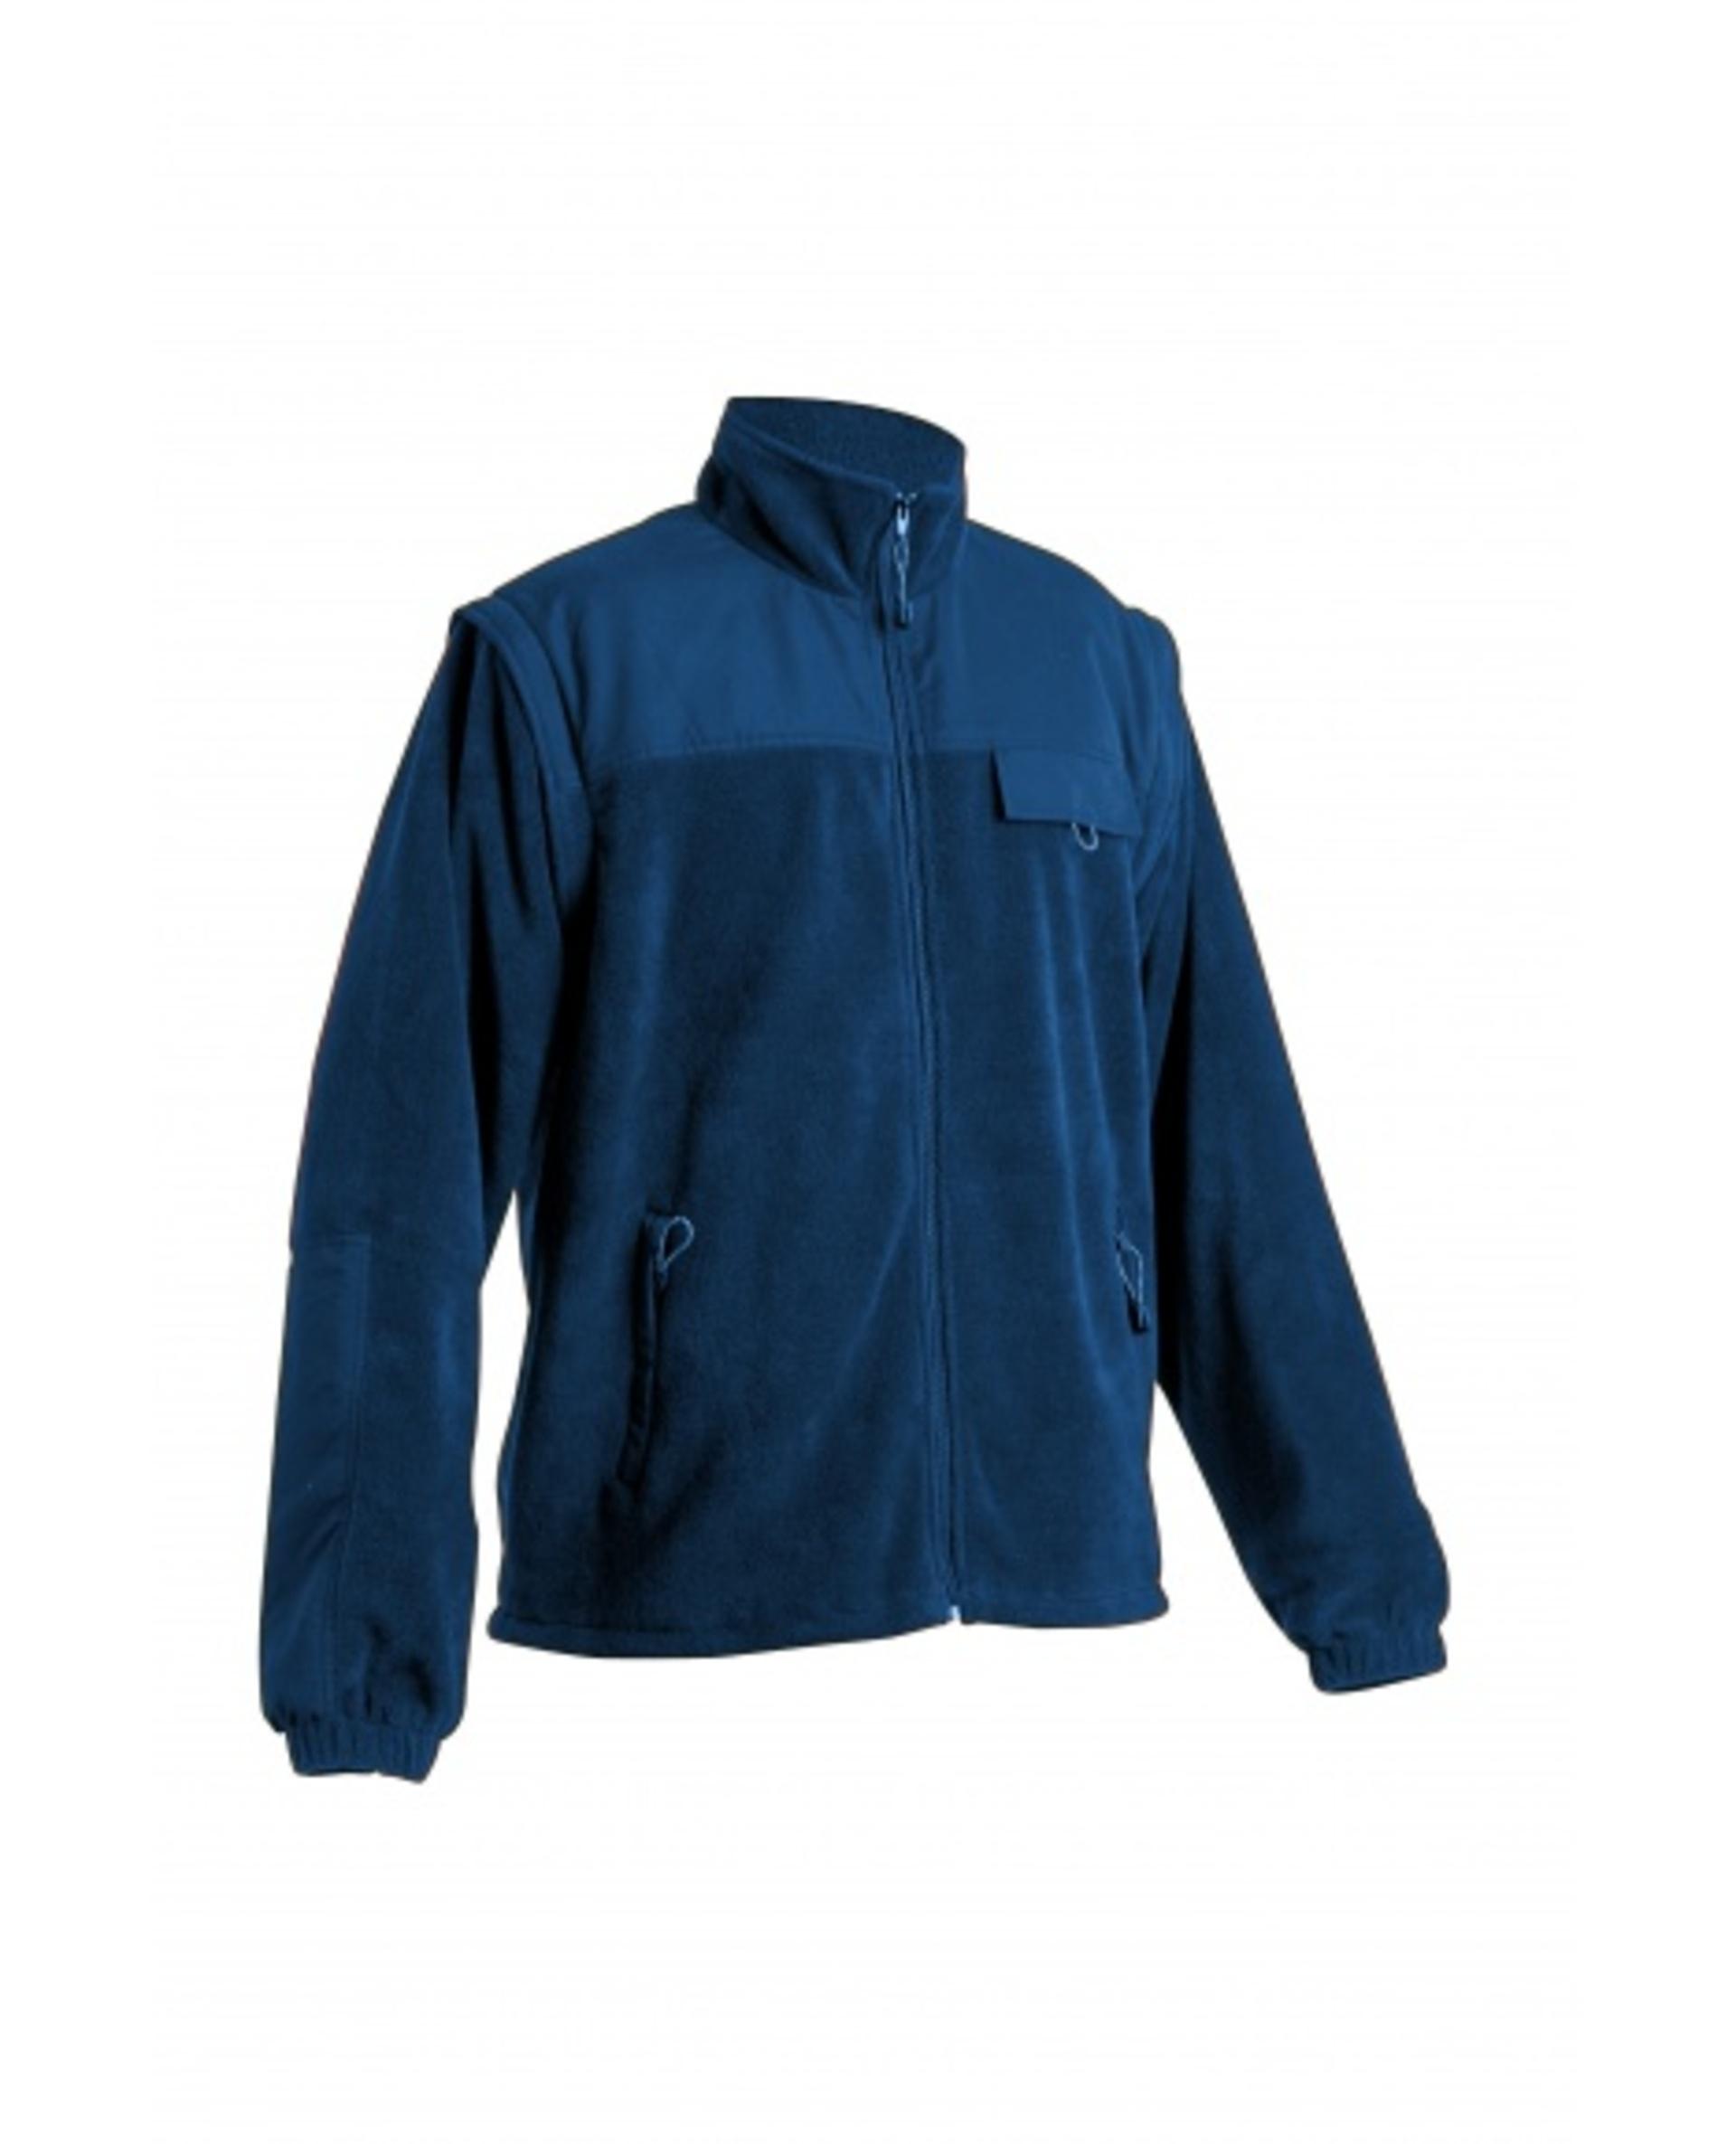 Cerva RANDWIK fleecová 2v1 Bunda tmavě modrá L